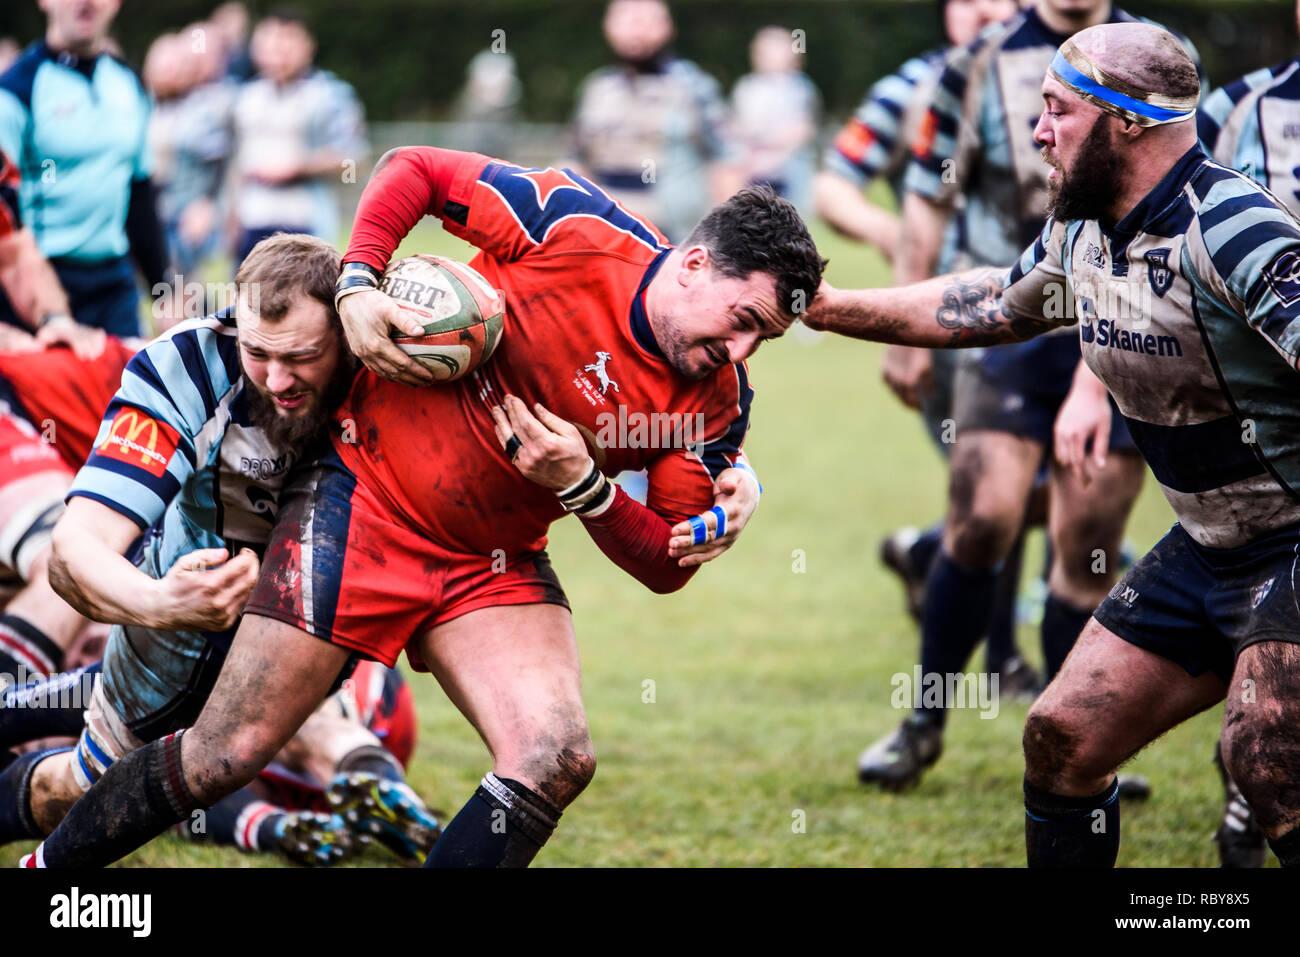 BLAINA, WALES, UK -18 FEBRUARY 2017: Blaina vs Machen Rugby Game, WRU Championship league match at Cwmcellyn Park Stock Photo